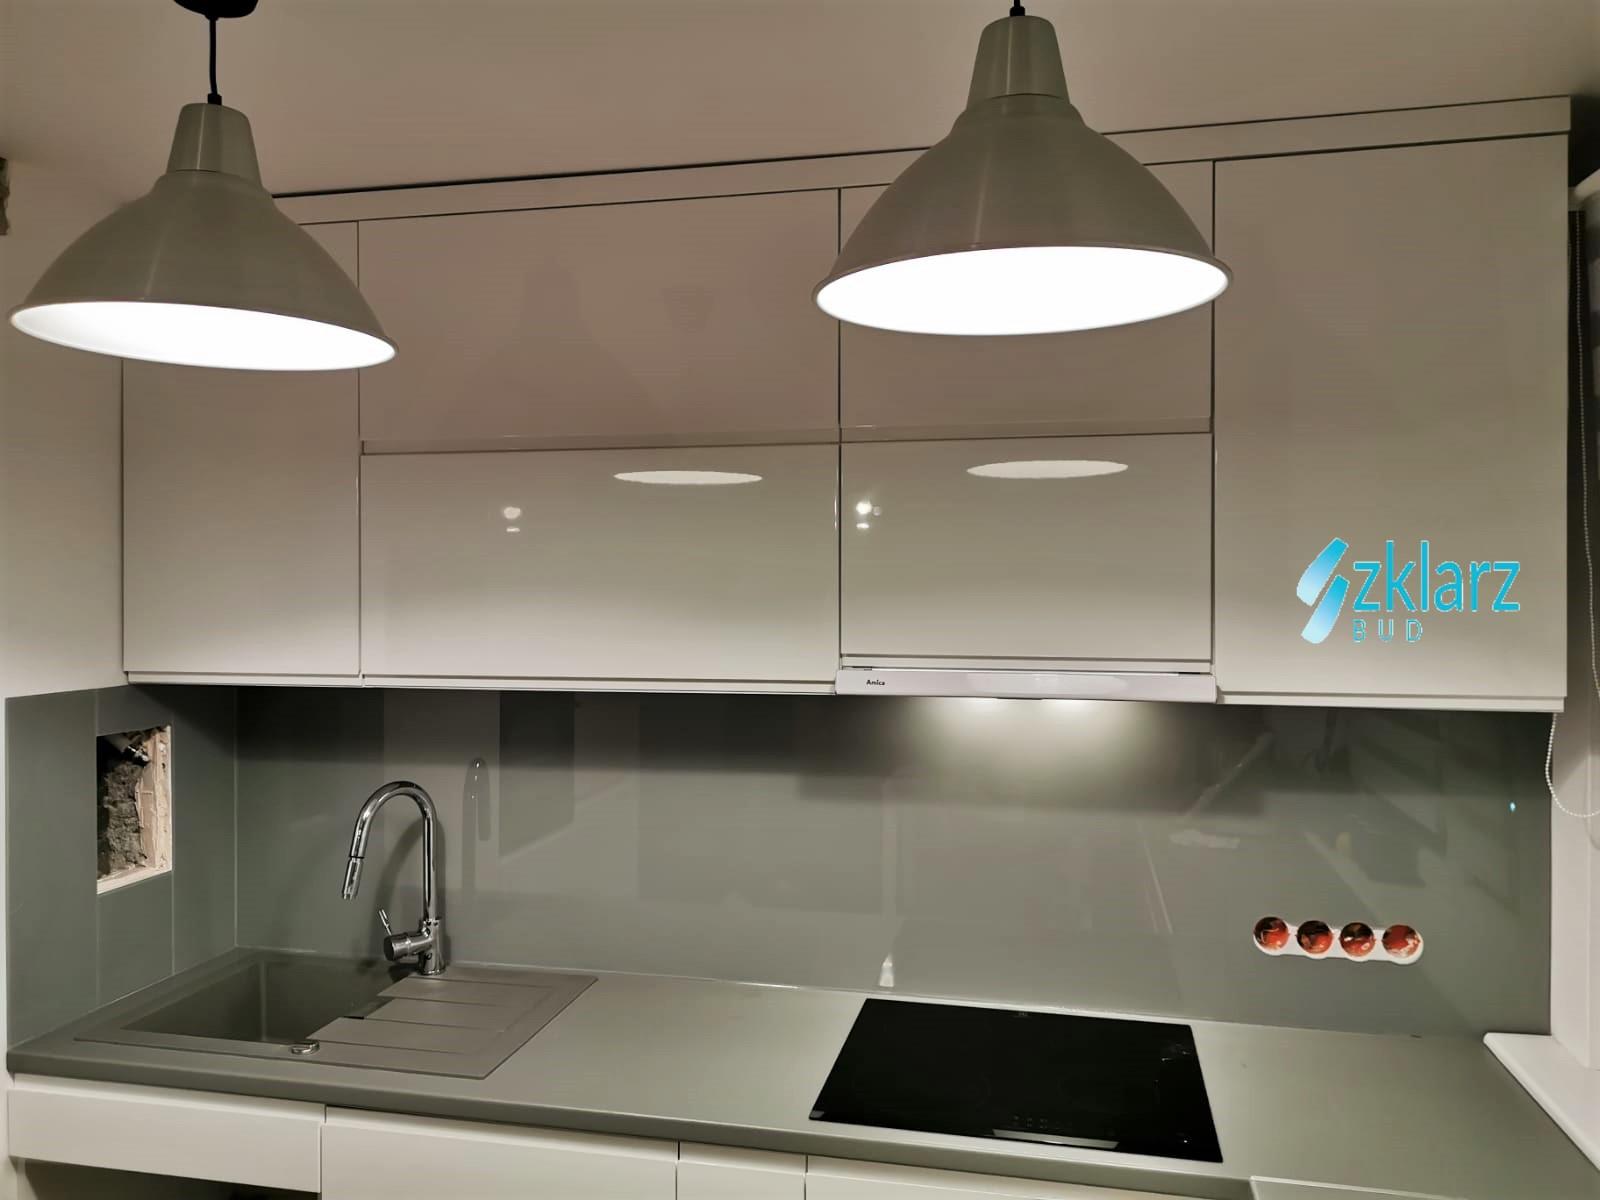 Panel kuchenny lakierowany